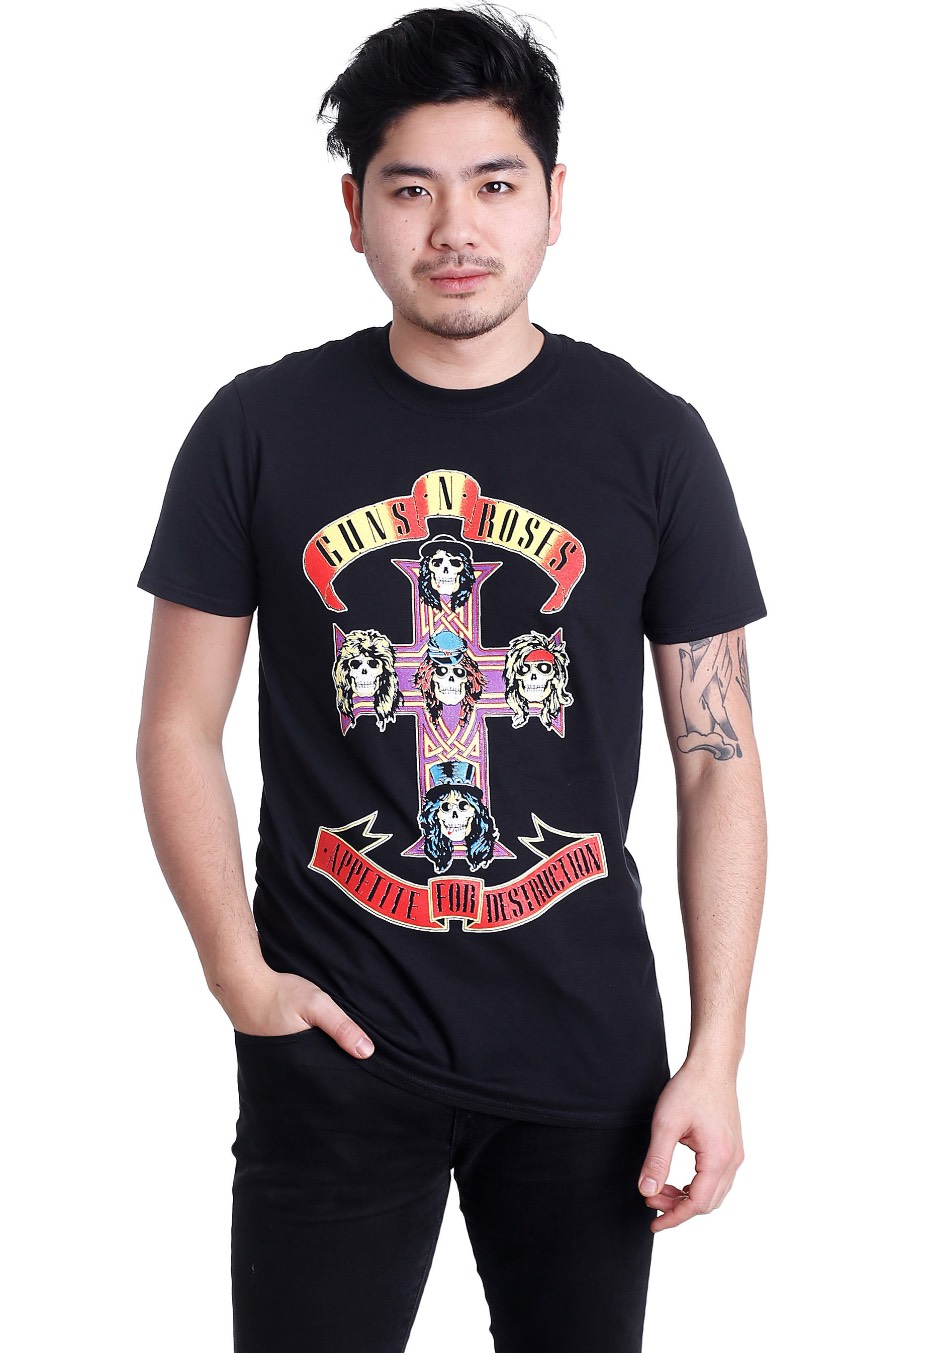 Guns n/'Roses Unisexe Tee Appetite For Destruction T-shirt Official Merchandise